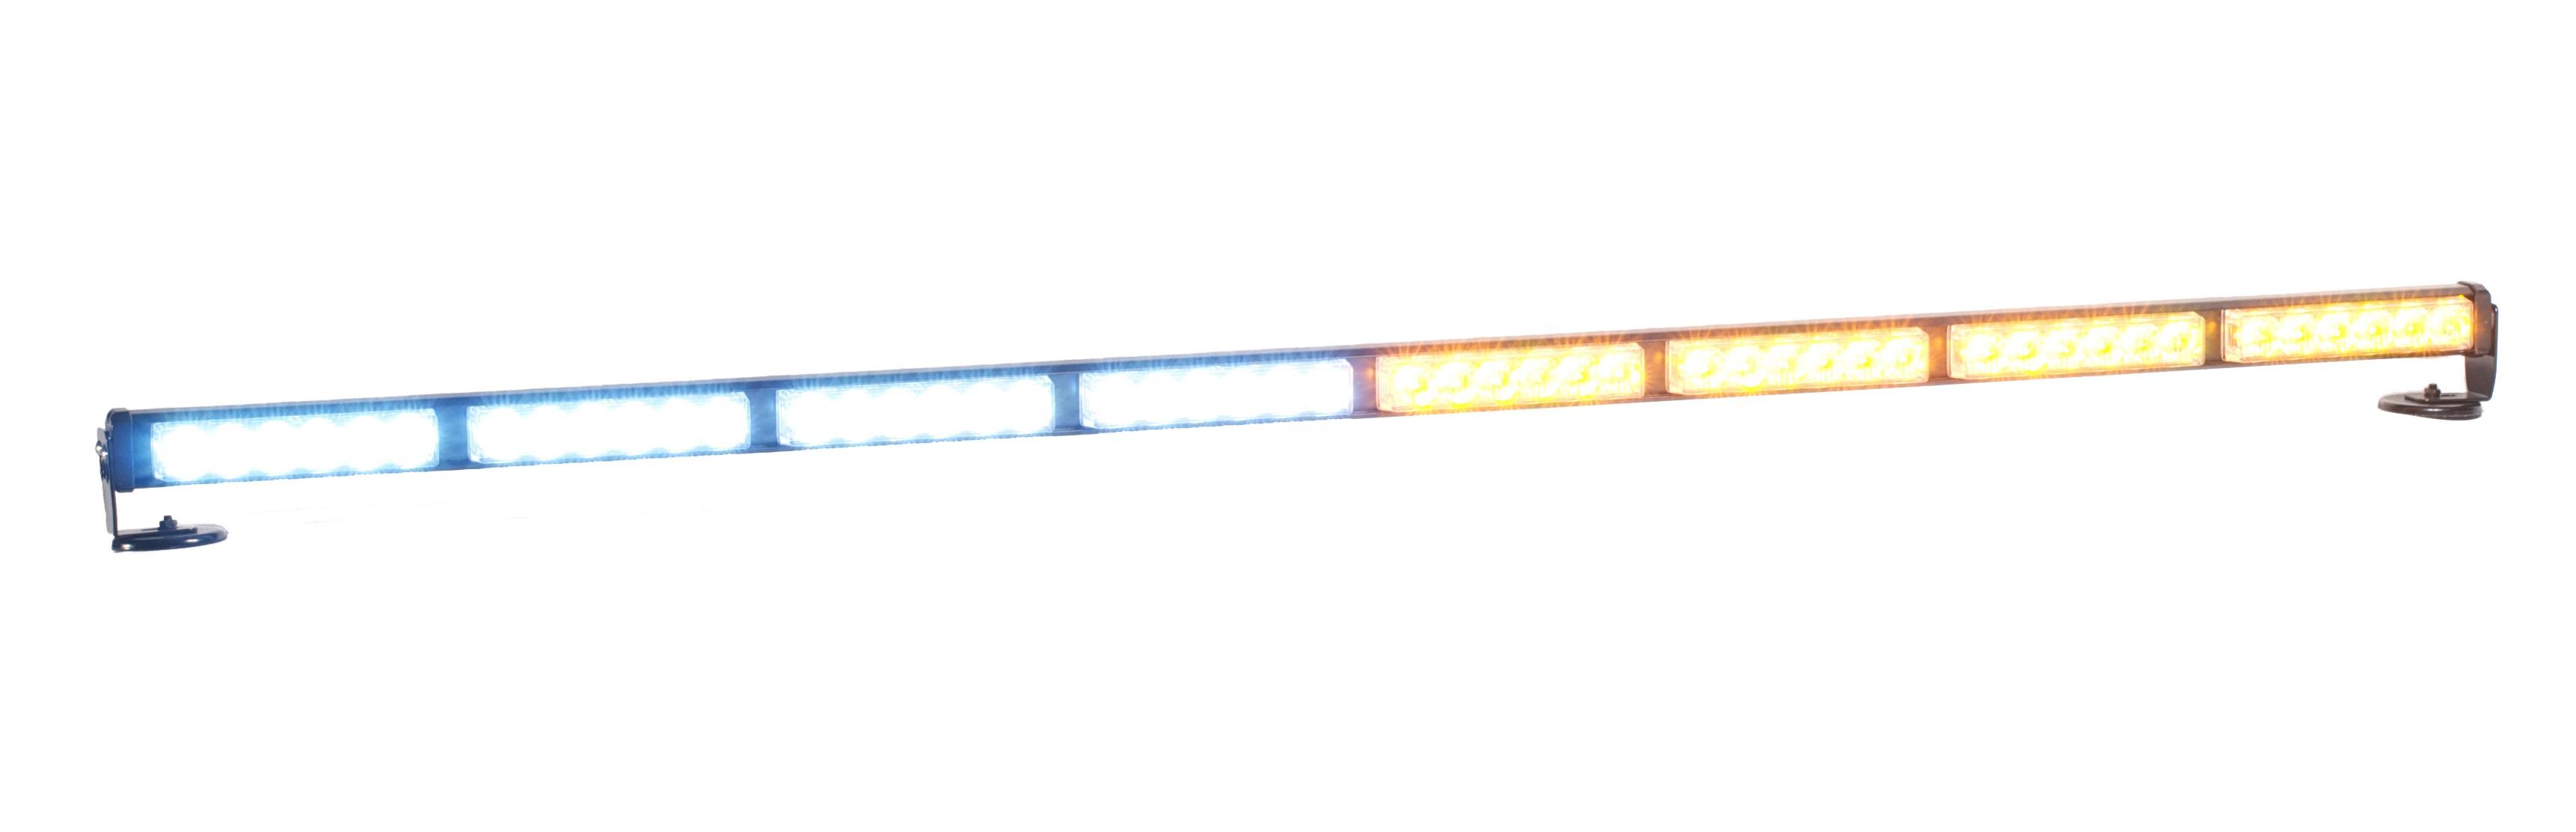 P8X6 50  LED Traffic Advisor Police Interior Light Bar ...  sc 1 st  AutoDitto & 50